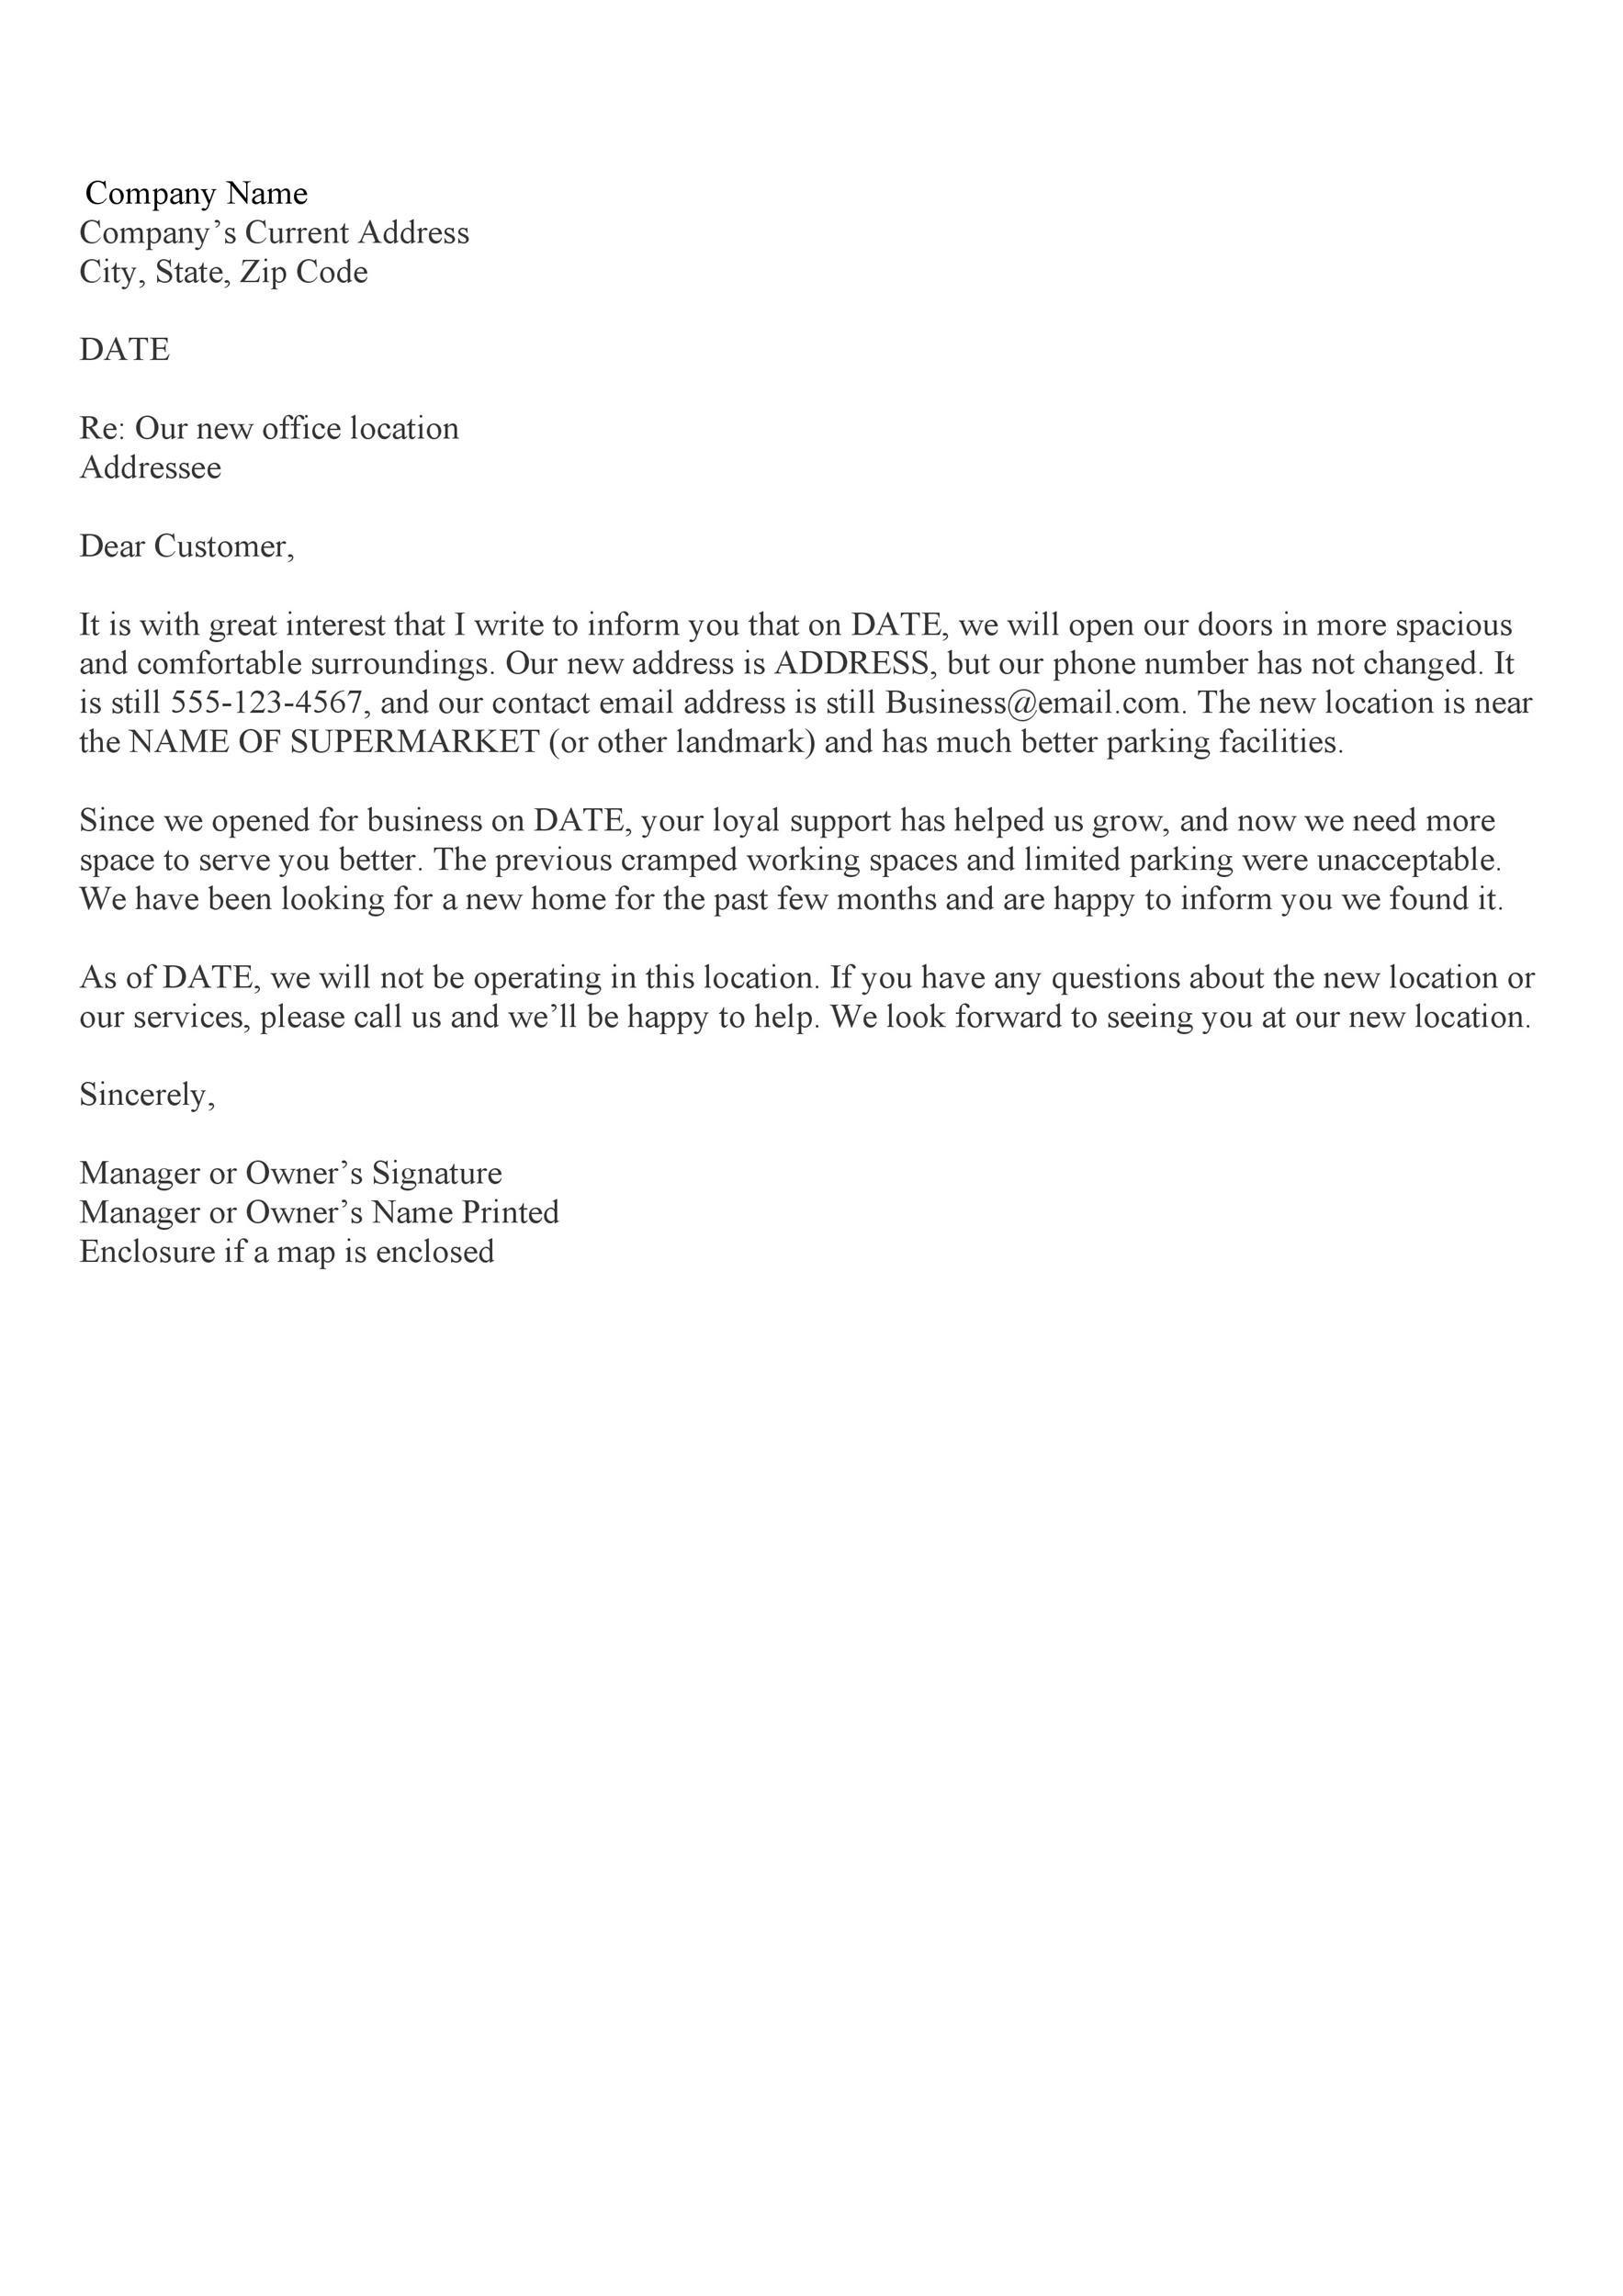 Free change of address letter 43